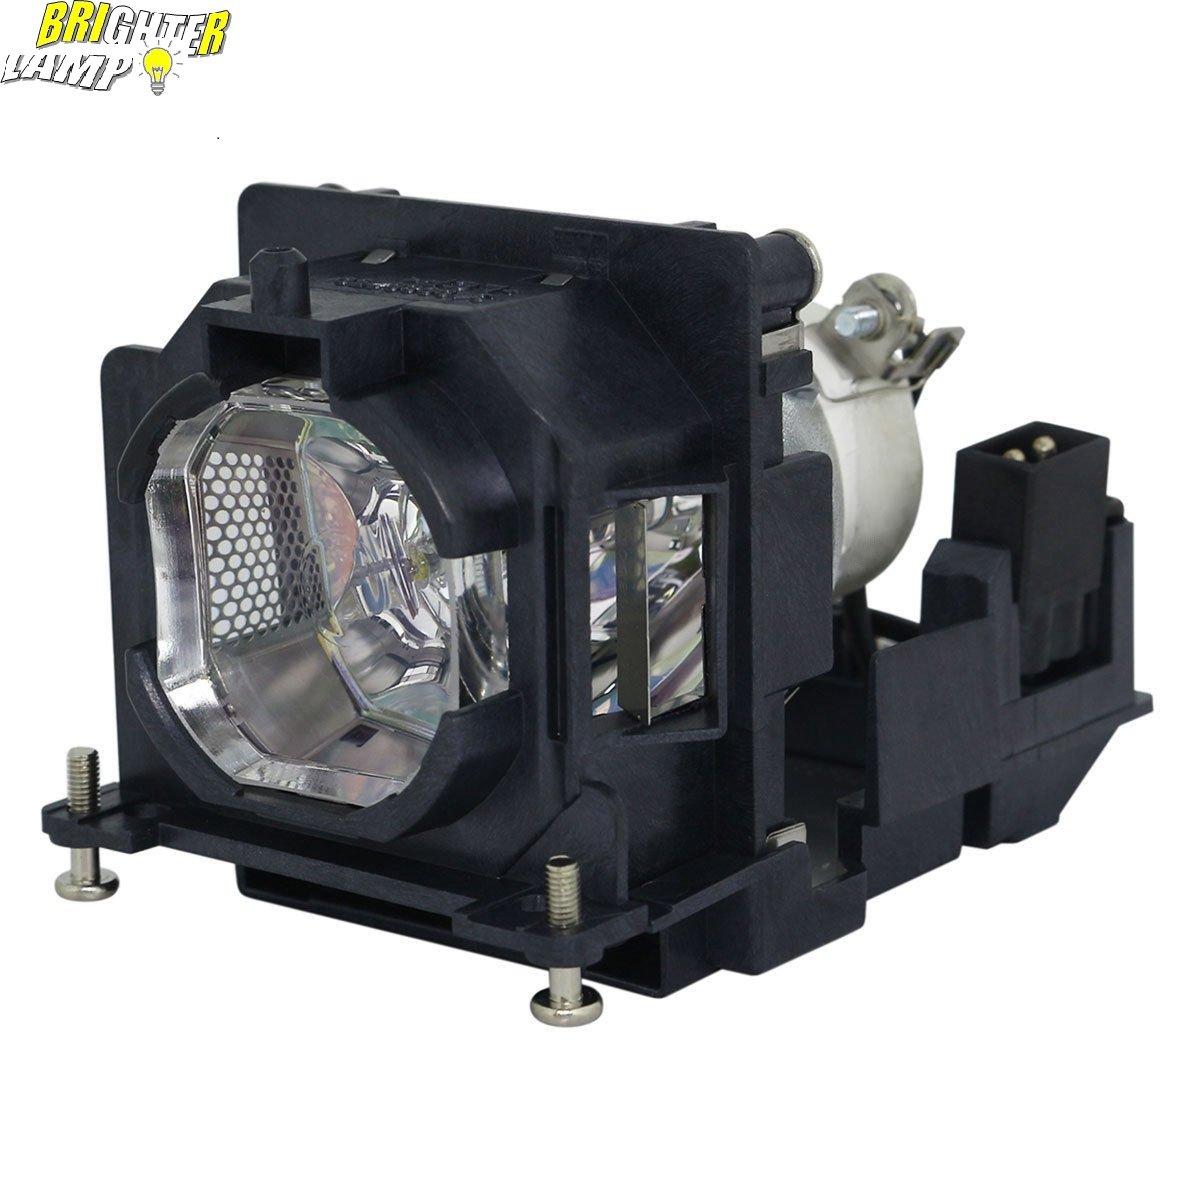 Brighter Lamp ET-LAL500 プロジェクター交換用ランプ 【ハウジング付き/高輝度/長寿命】for PanasonicパナソニックPT-TX310   B0769HPFT6